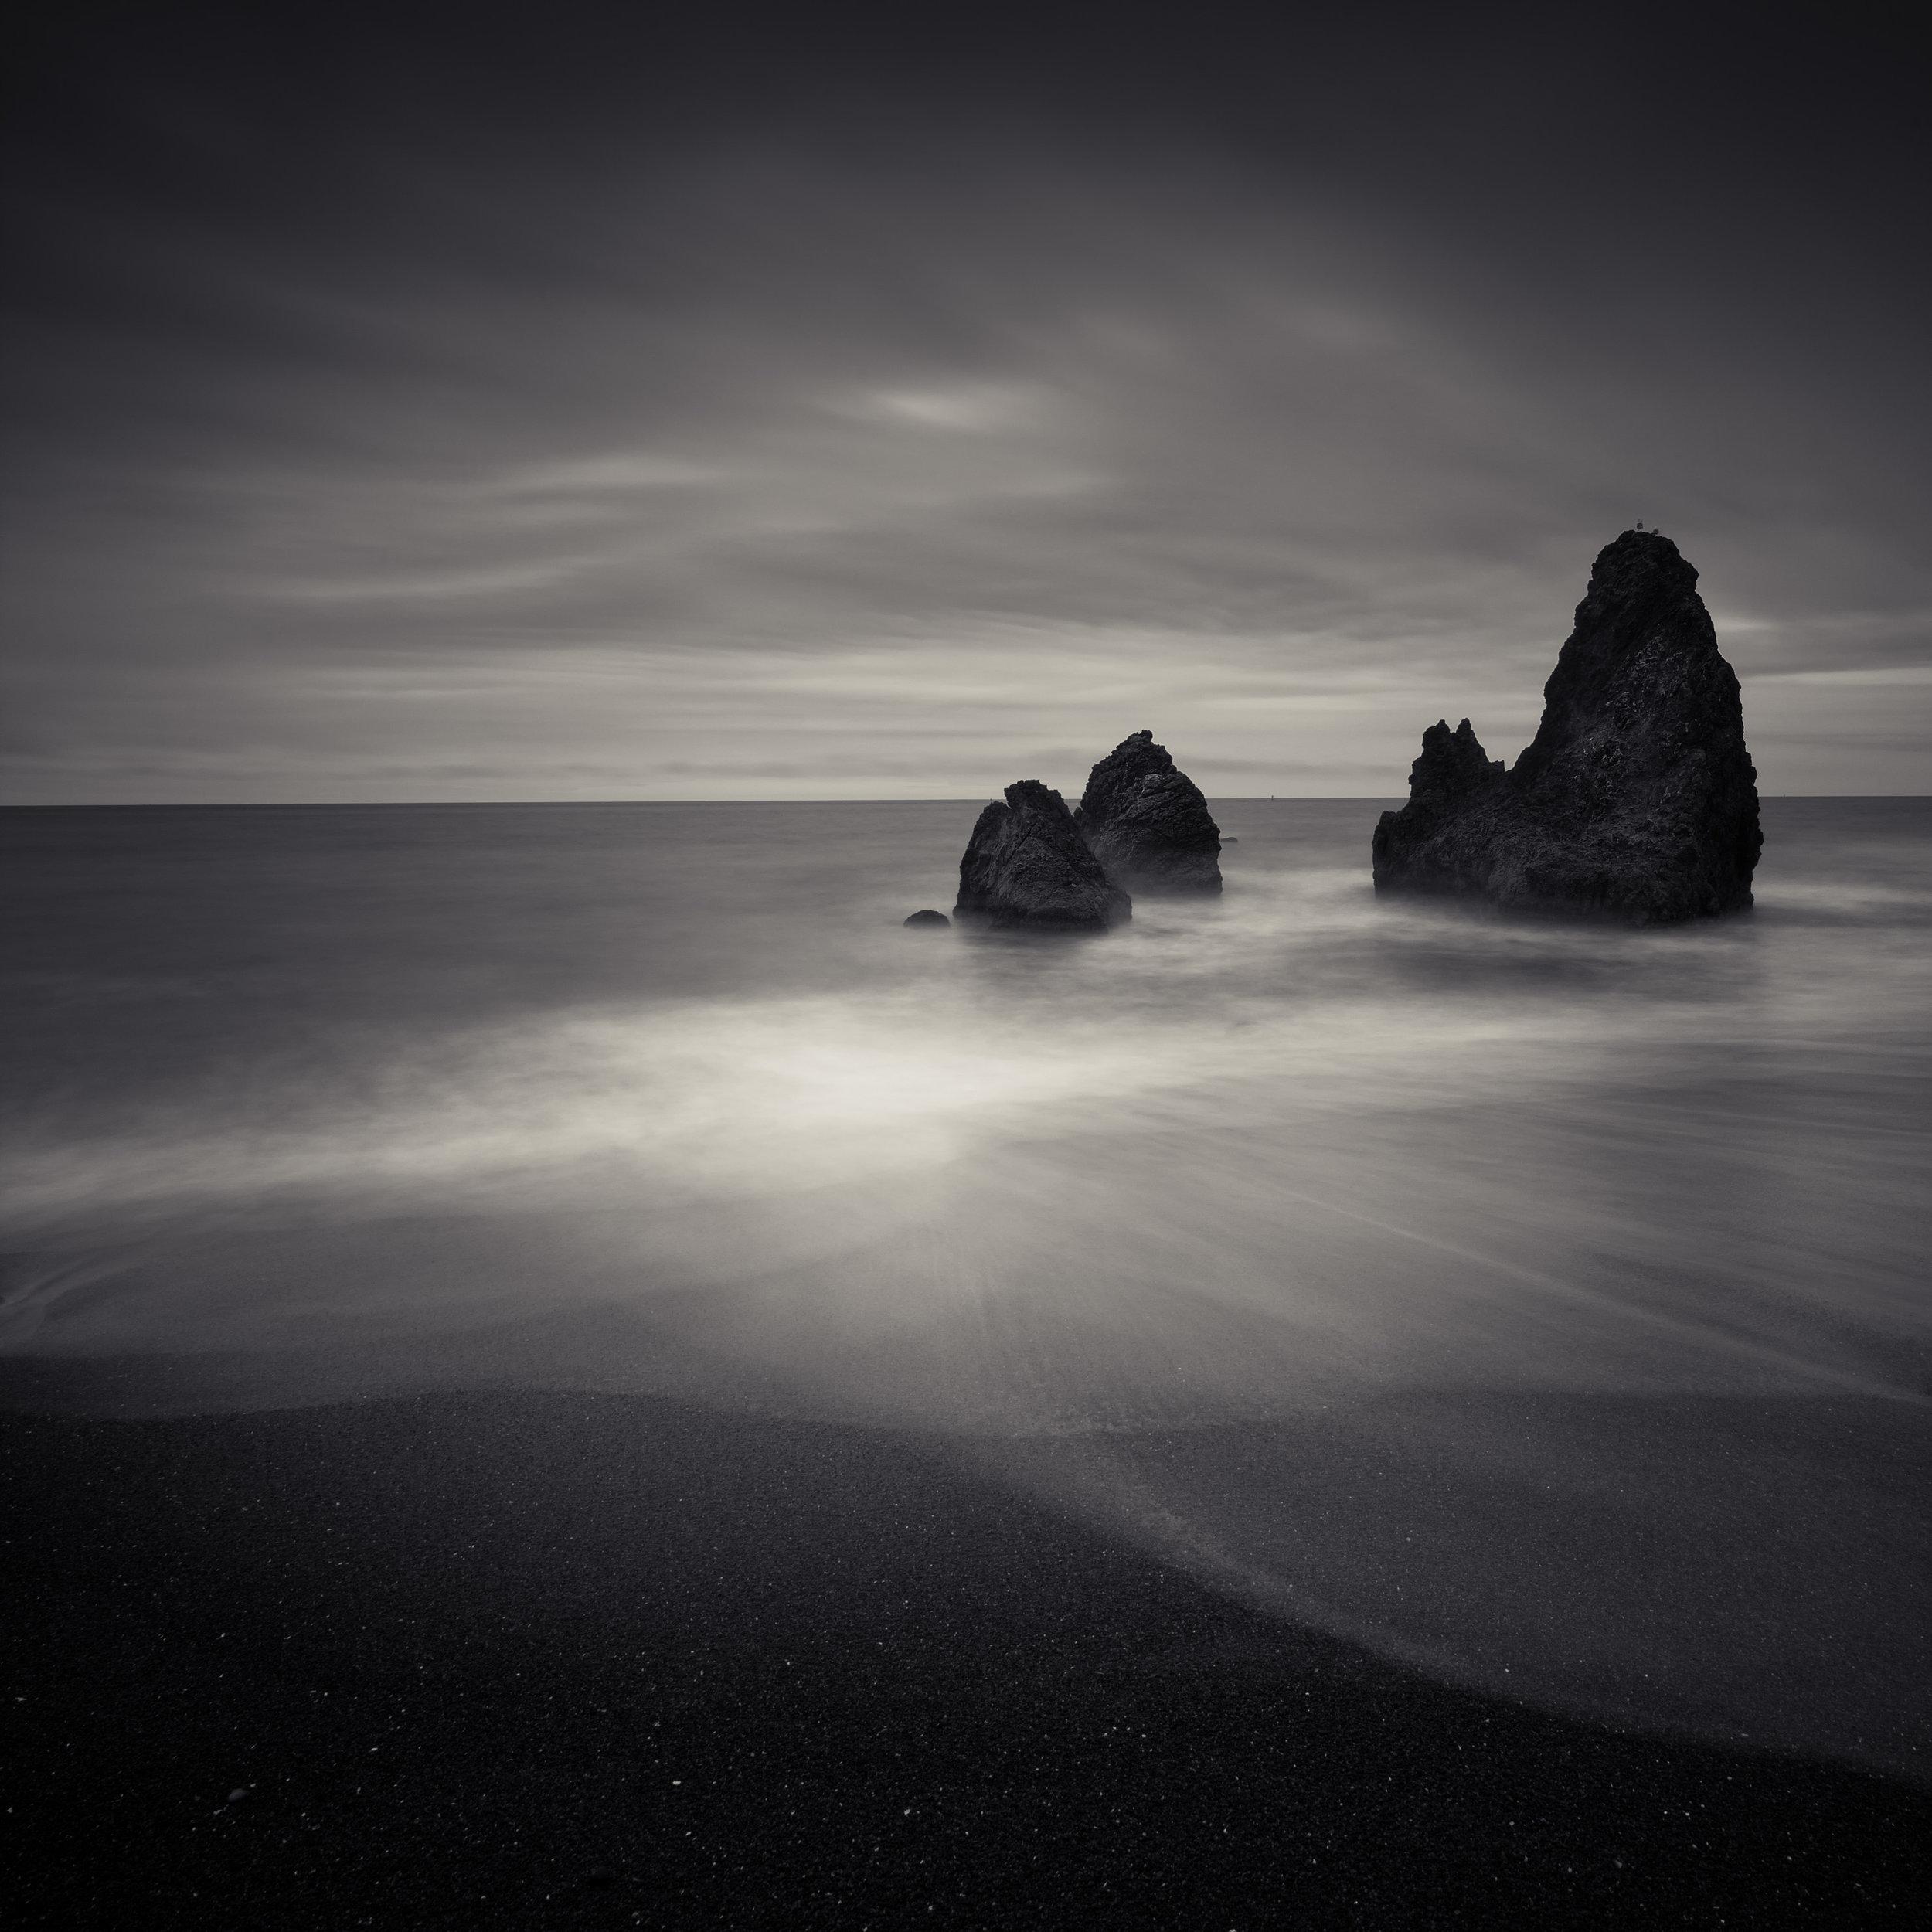 Rodeo Beach black white rocks meditative moody